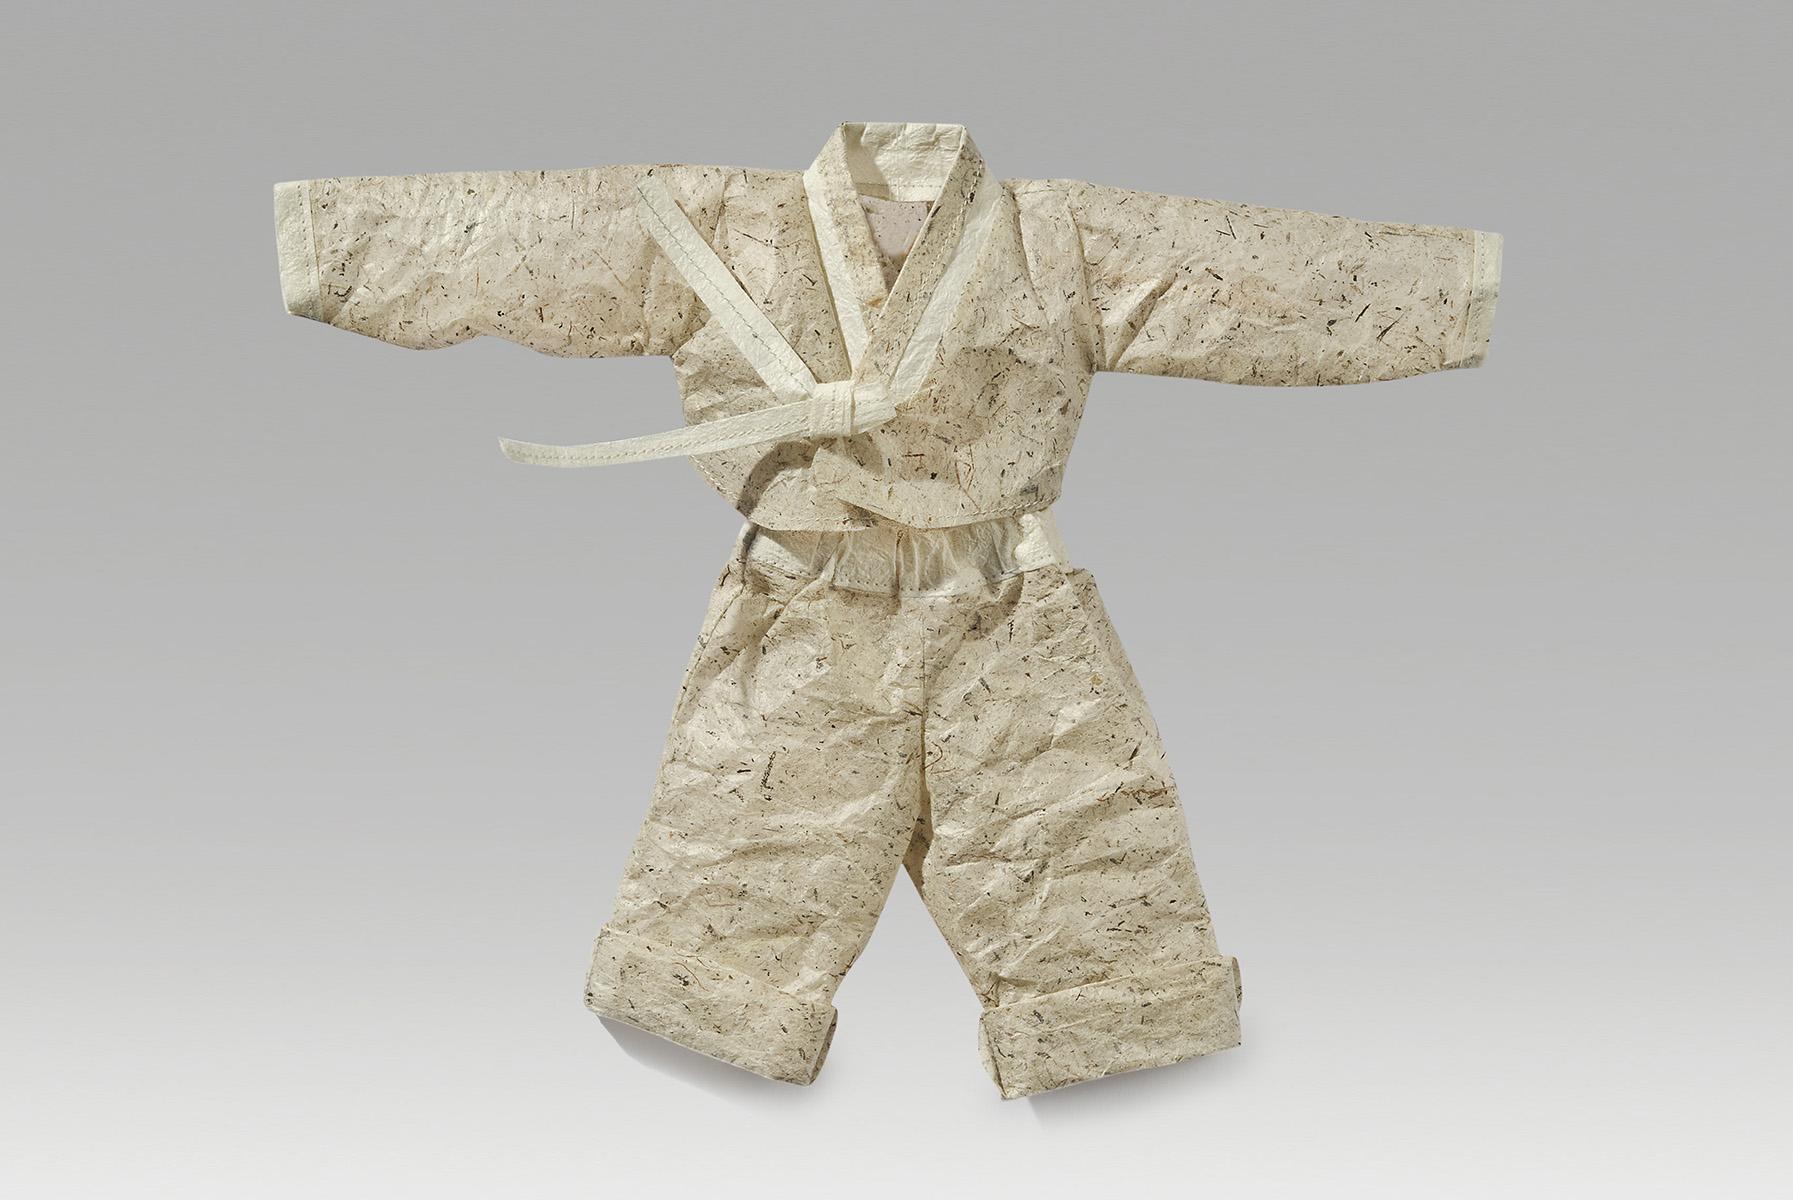 "Industry (2017). Handmade milkweed paper, hanji, thread. 10 x 12"". Private collection."